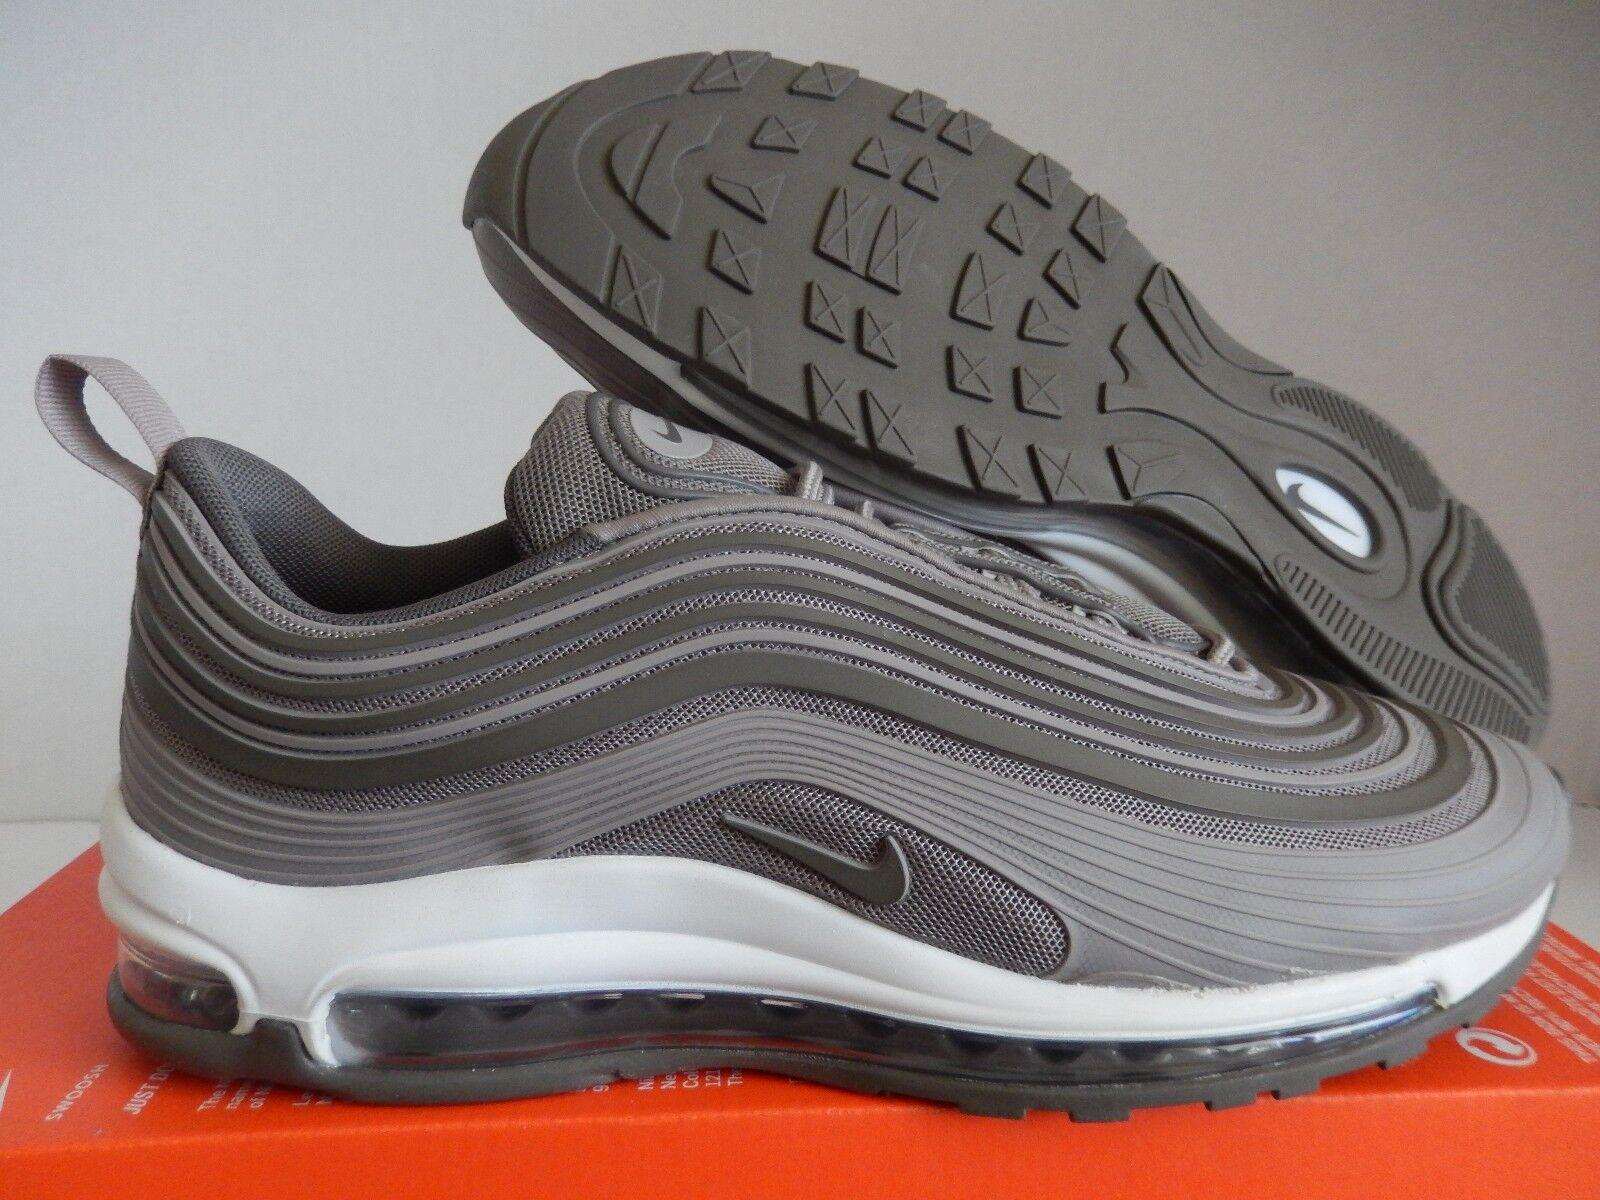 Nike air max 97 ul ultra '17 premi sepia stone-ridgerock-wht sz 9 [ah7581-200]